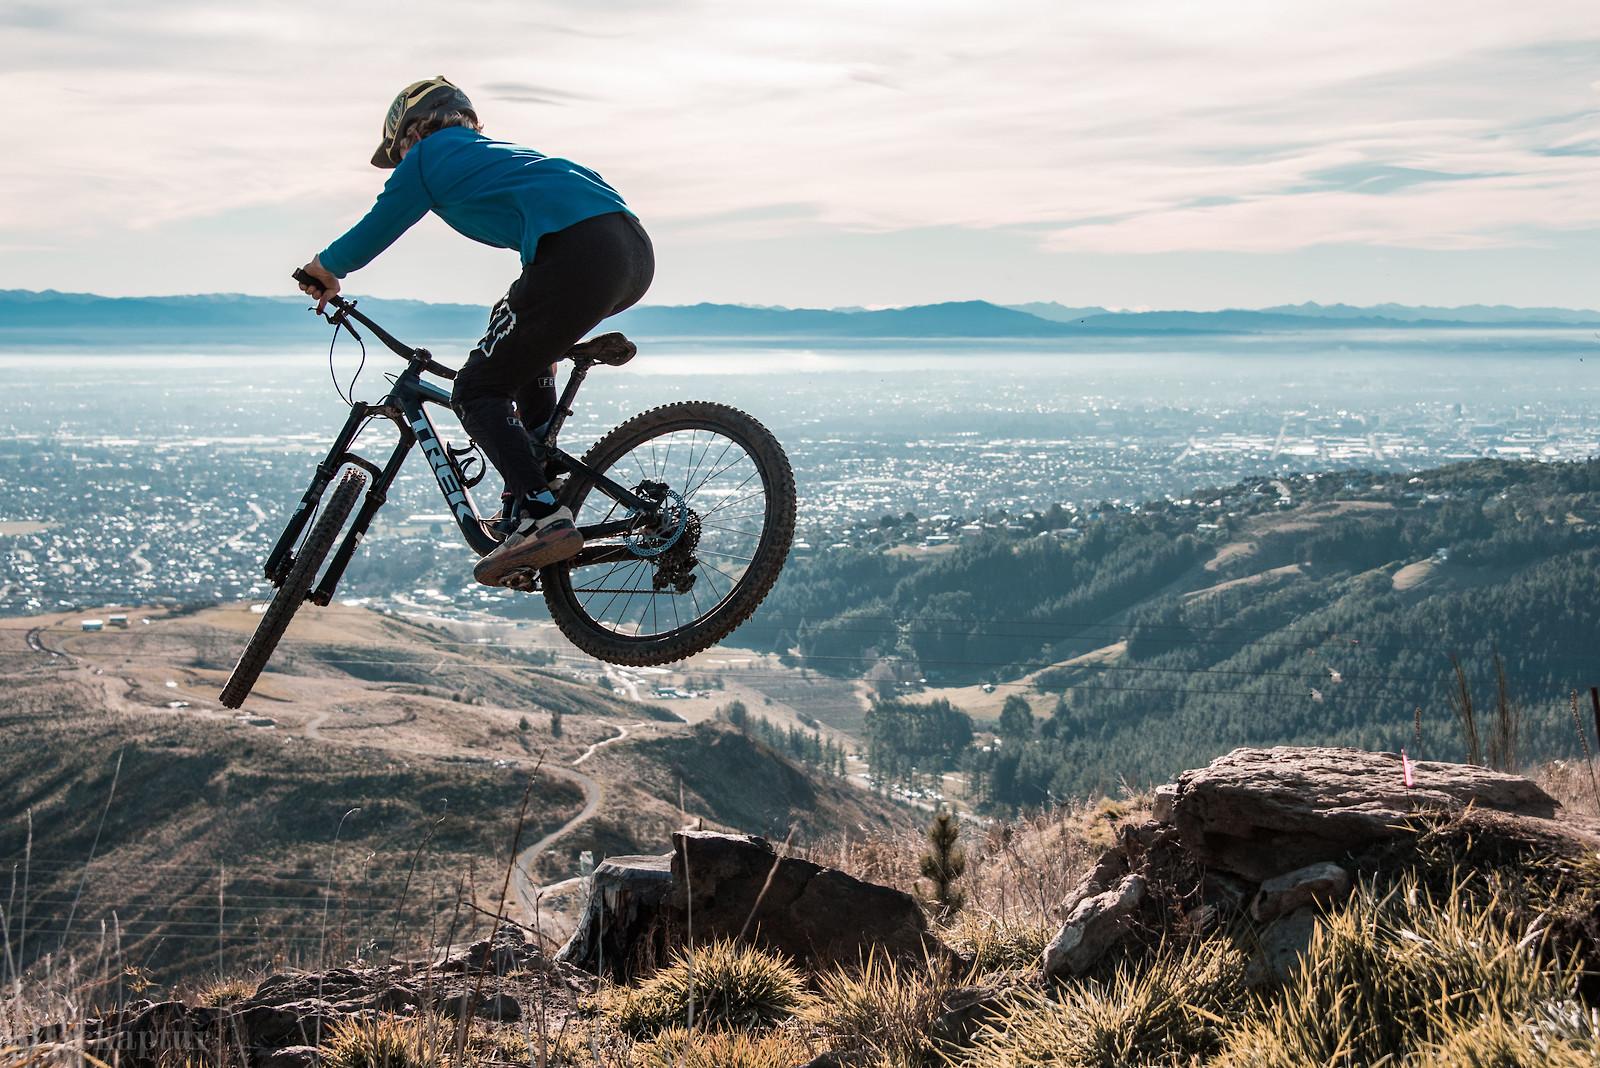 Hazy Horizons Steeze - specializedphotog - Mountain Biking Pictures - Vital MTB